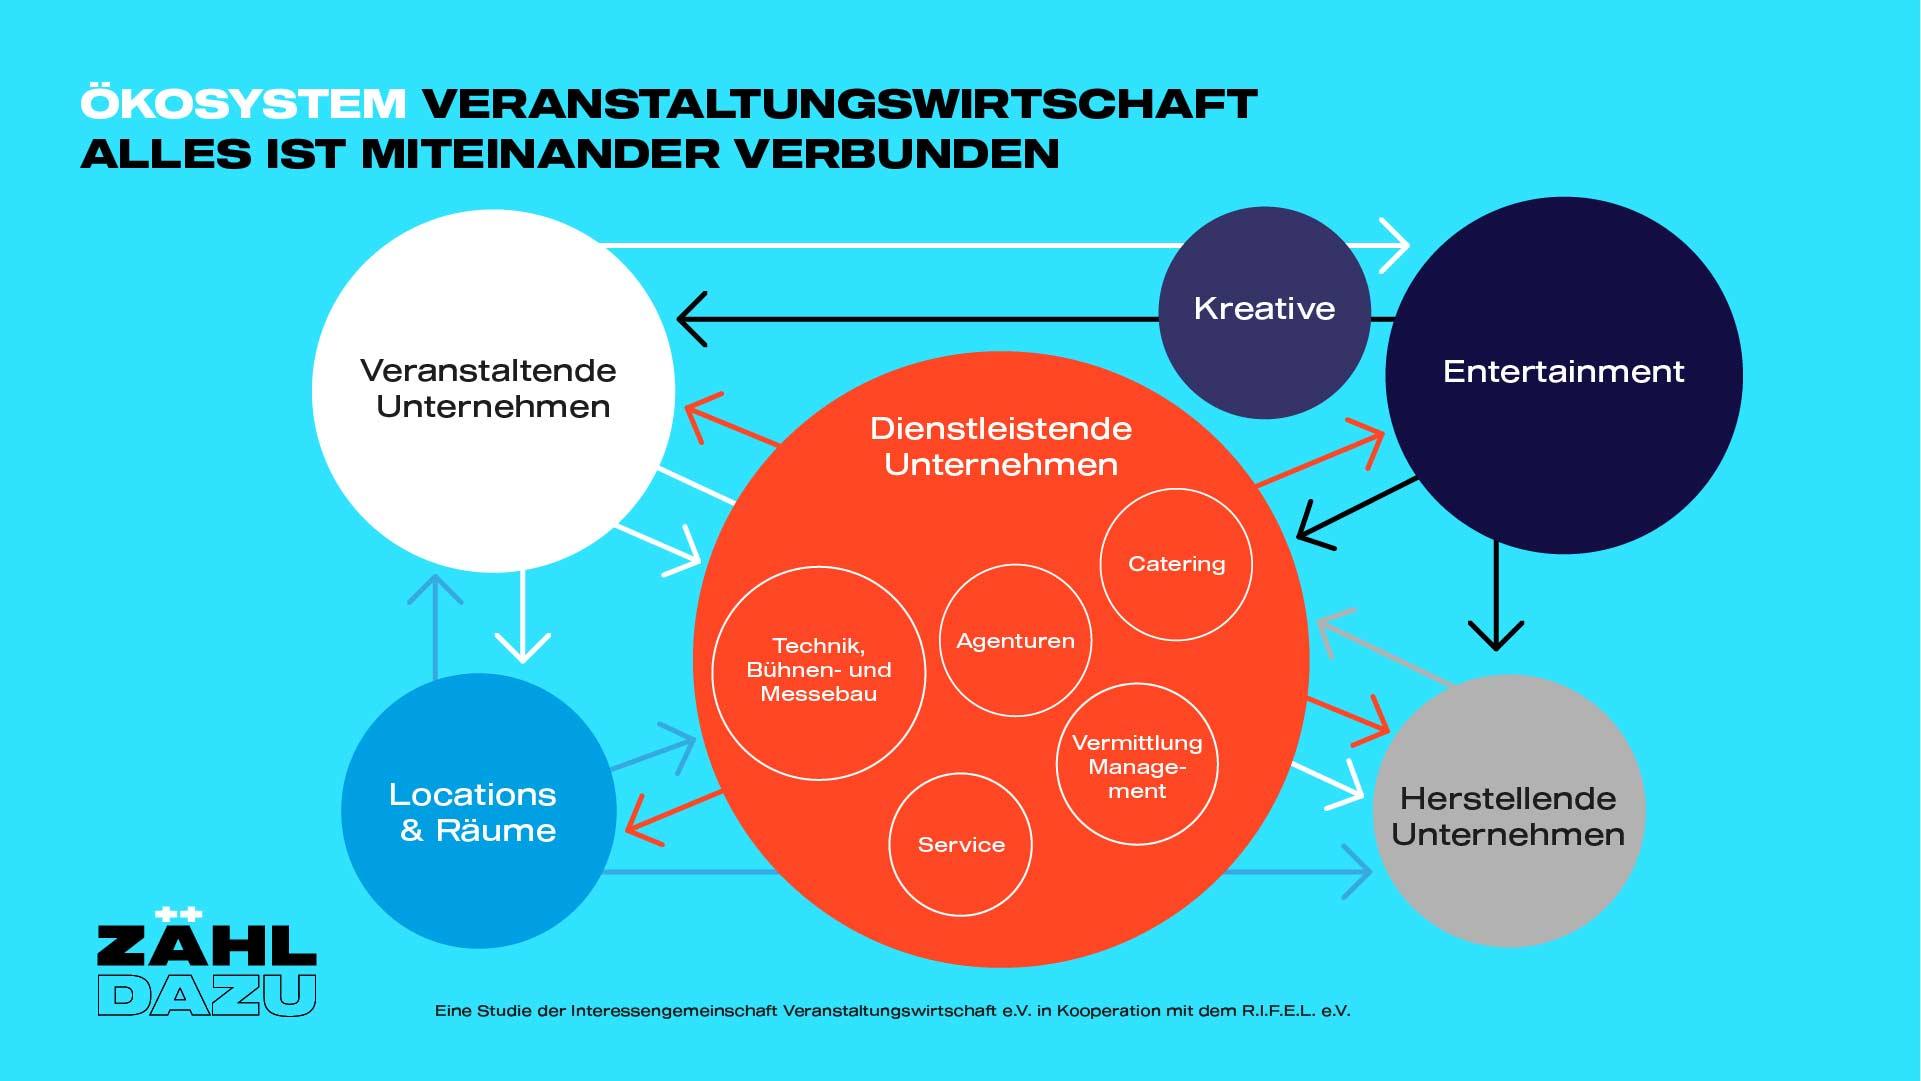 zaehl-dazu_Cluster_Alles-verbunden_neu